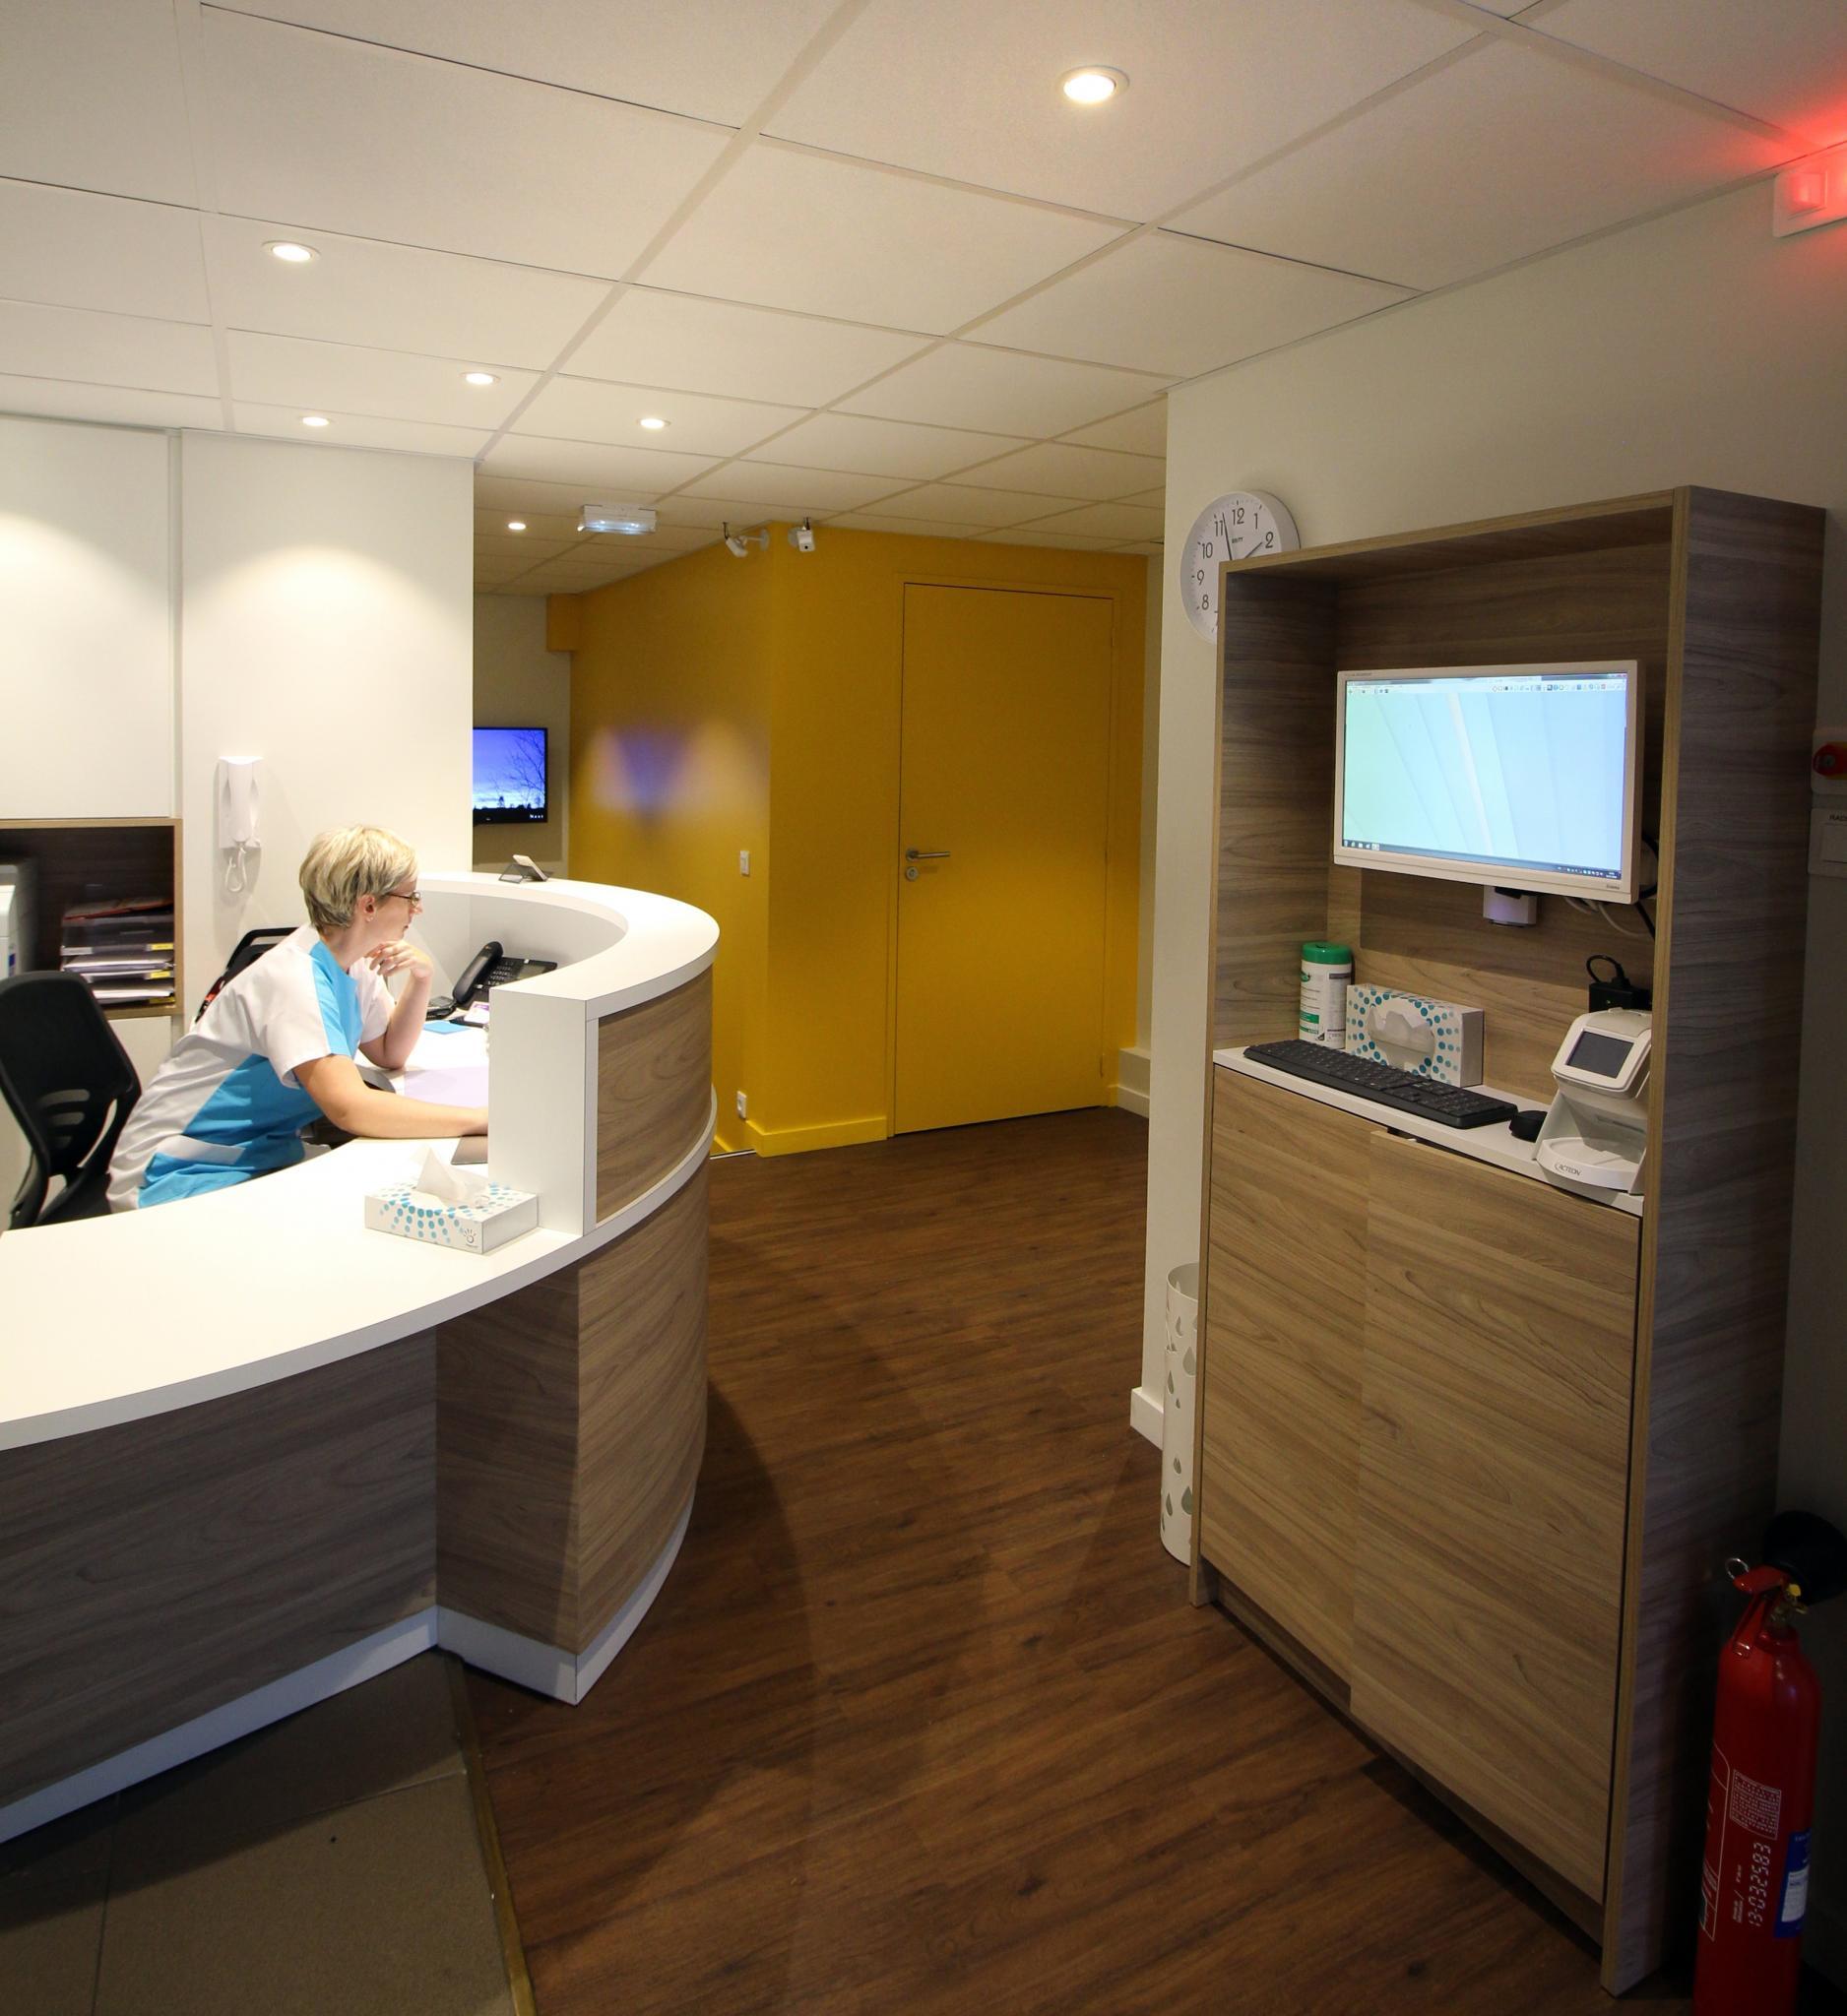 visiter le cabinet dentaire nantes 44000 dentiste cabinet dentaire fran ois et pierre senage. Black Bedroom Furniture Sets. Home Design Ideas